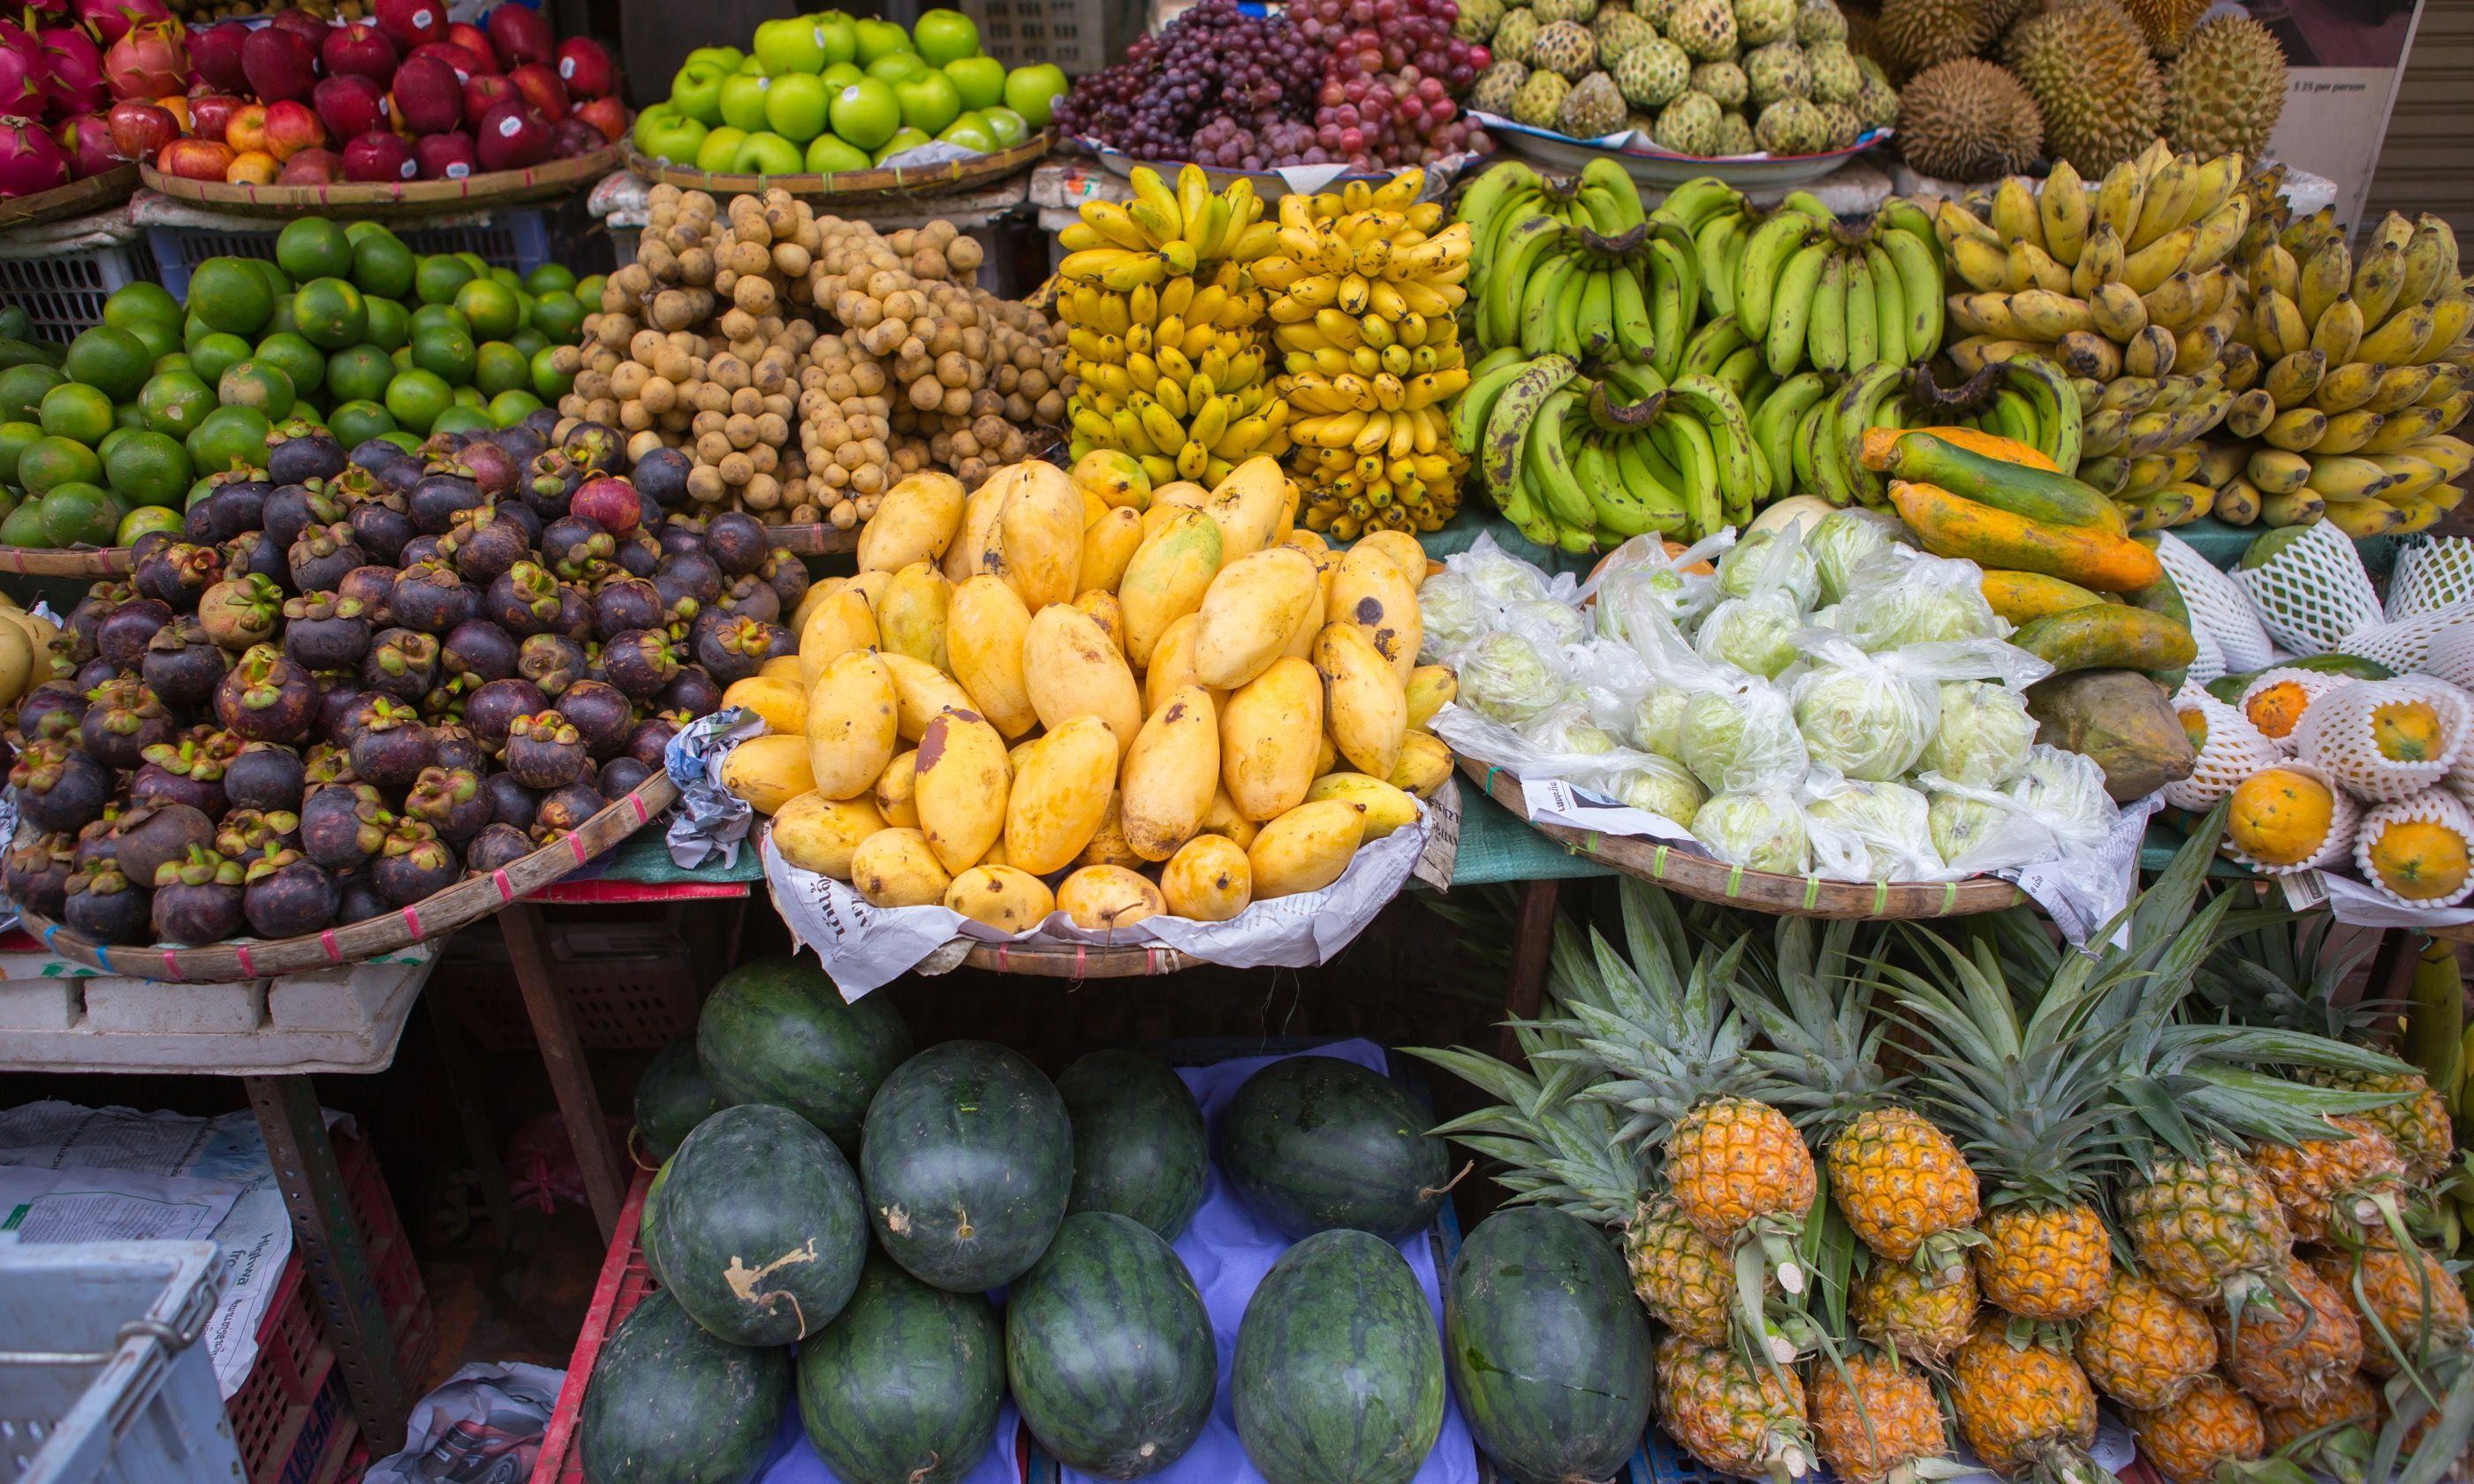 Roadside fruit stall, Laos (Shutterstock.com)